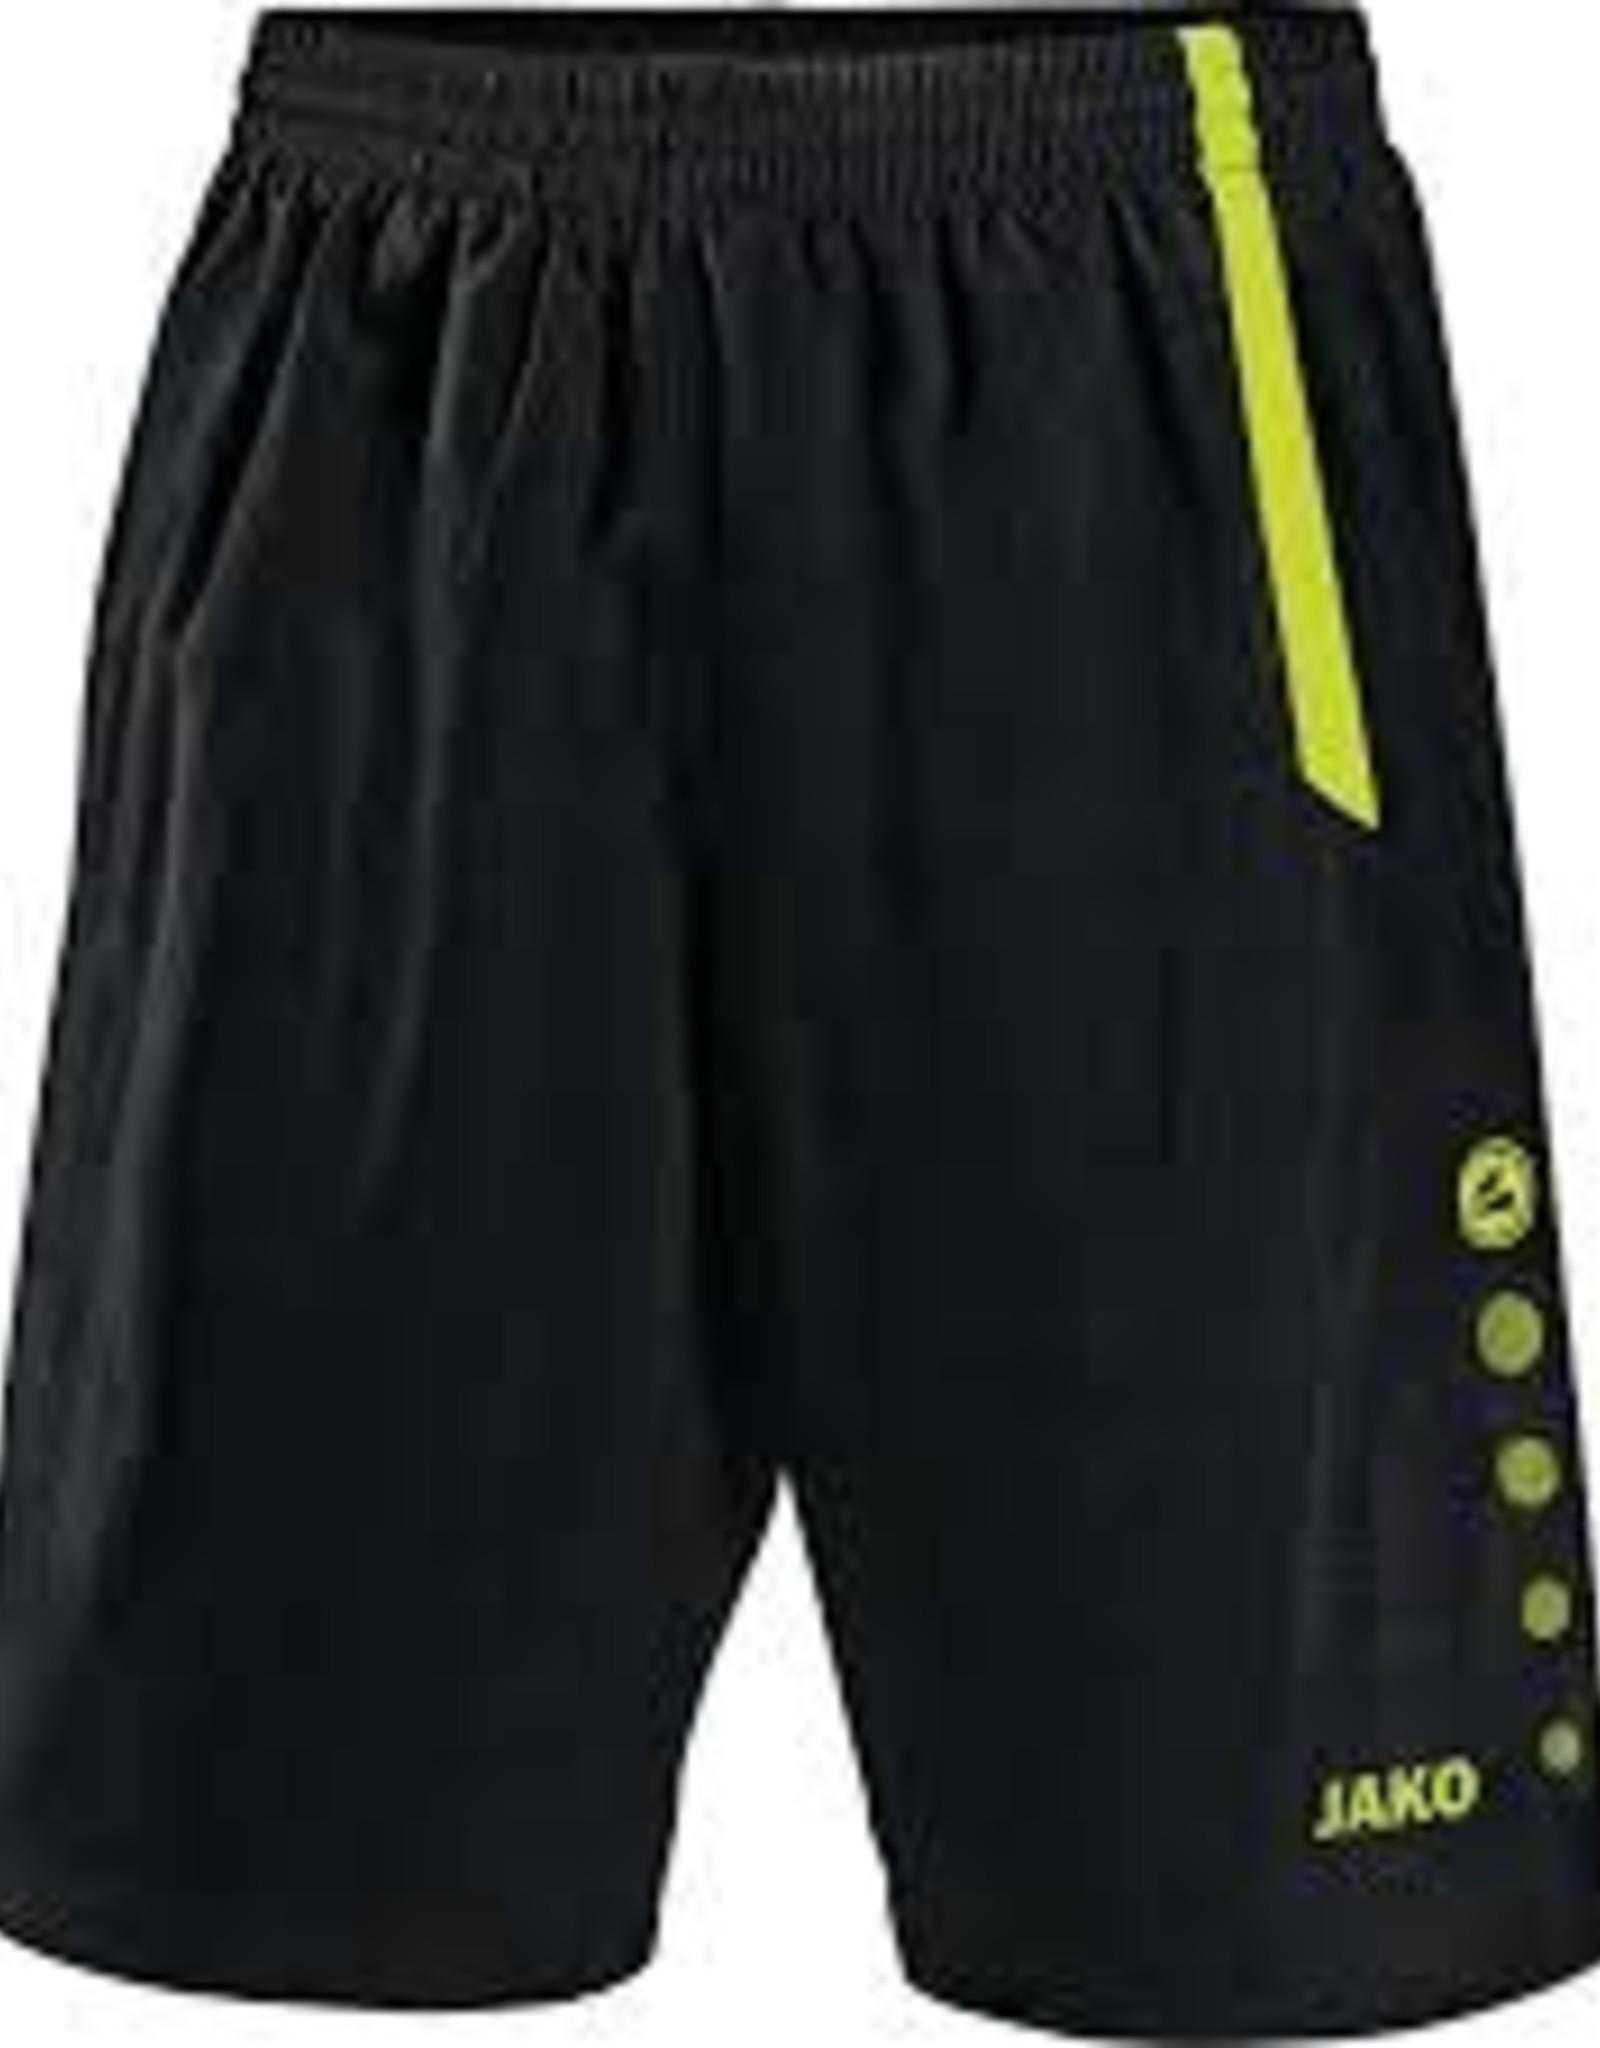 short turin zwart/fluo L